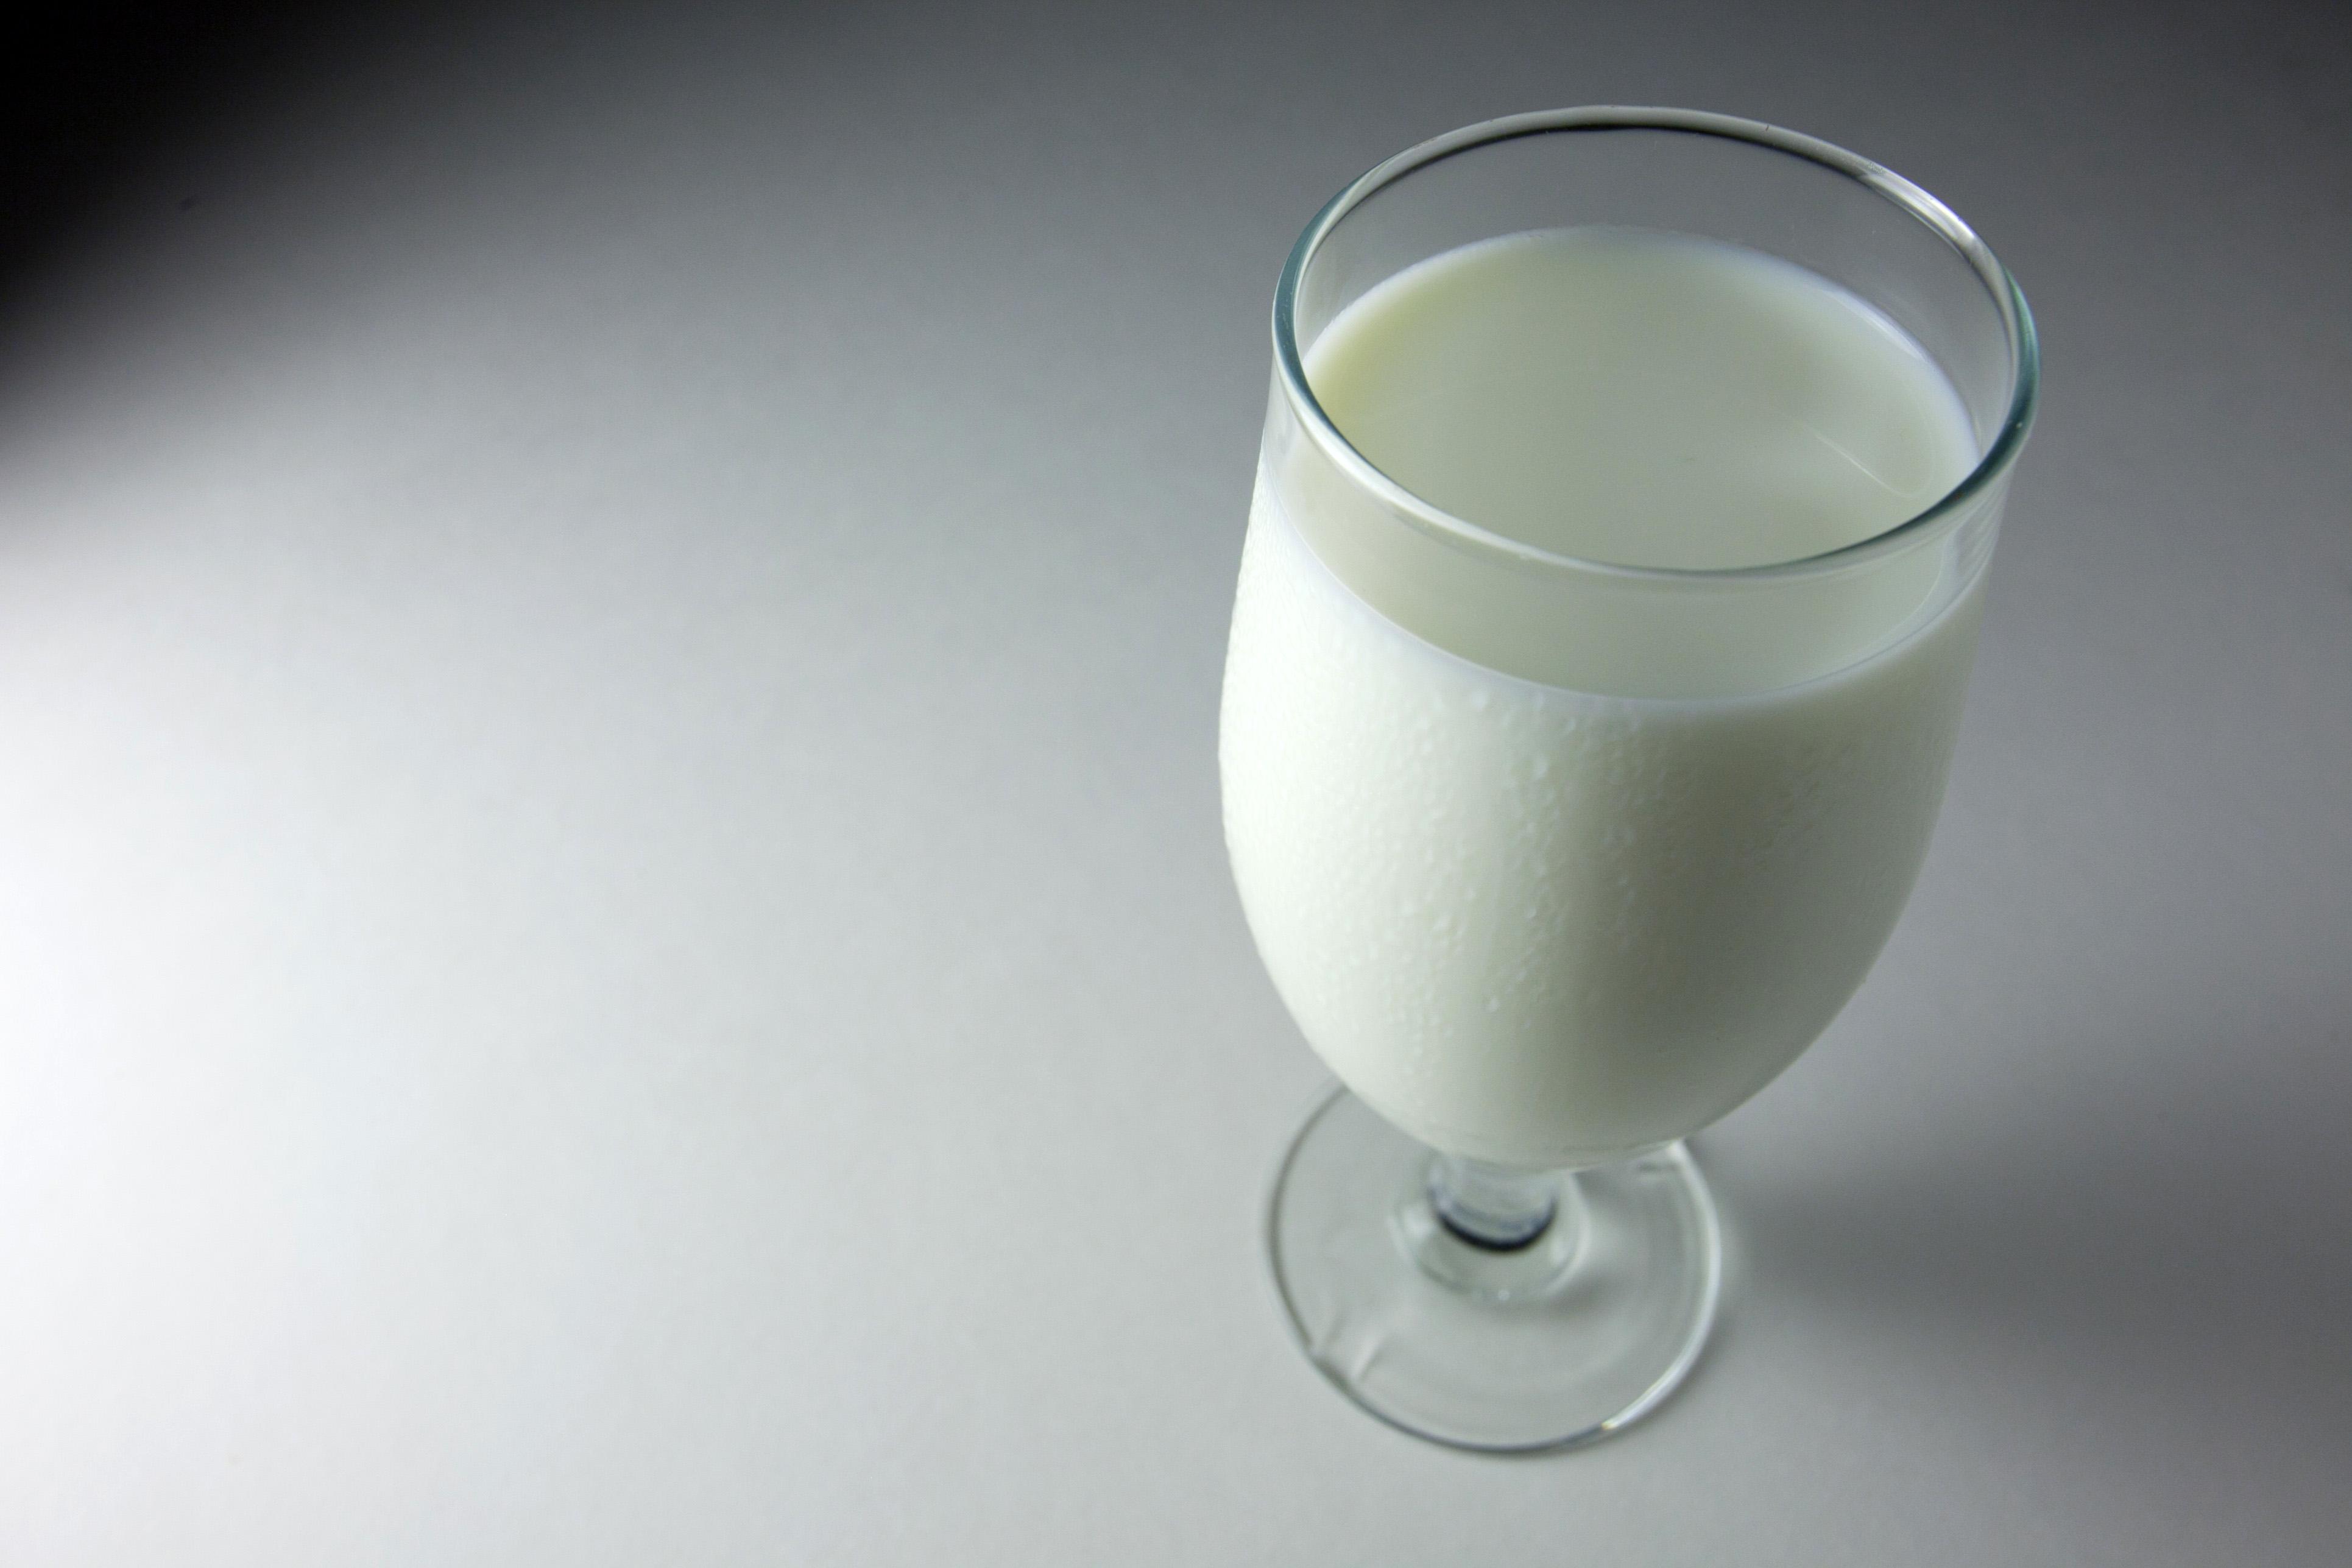 milk glass wide wallpaper 52137